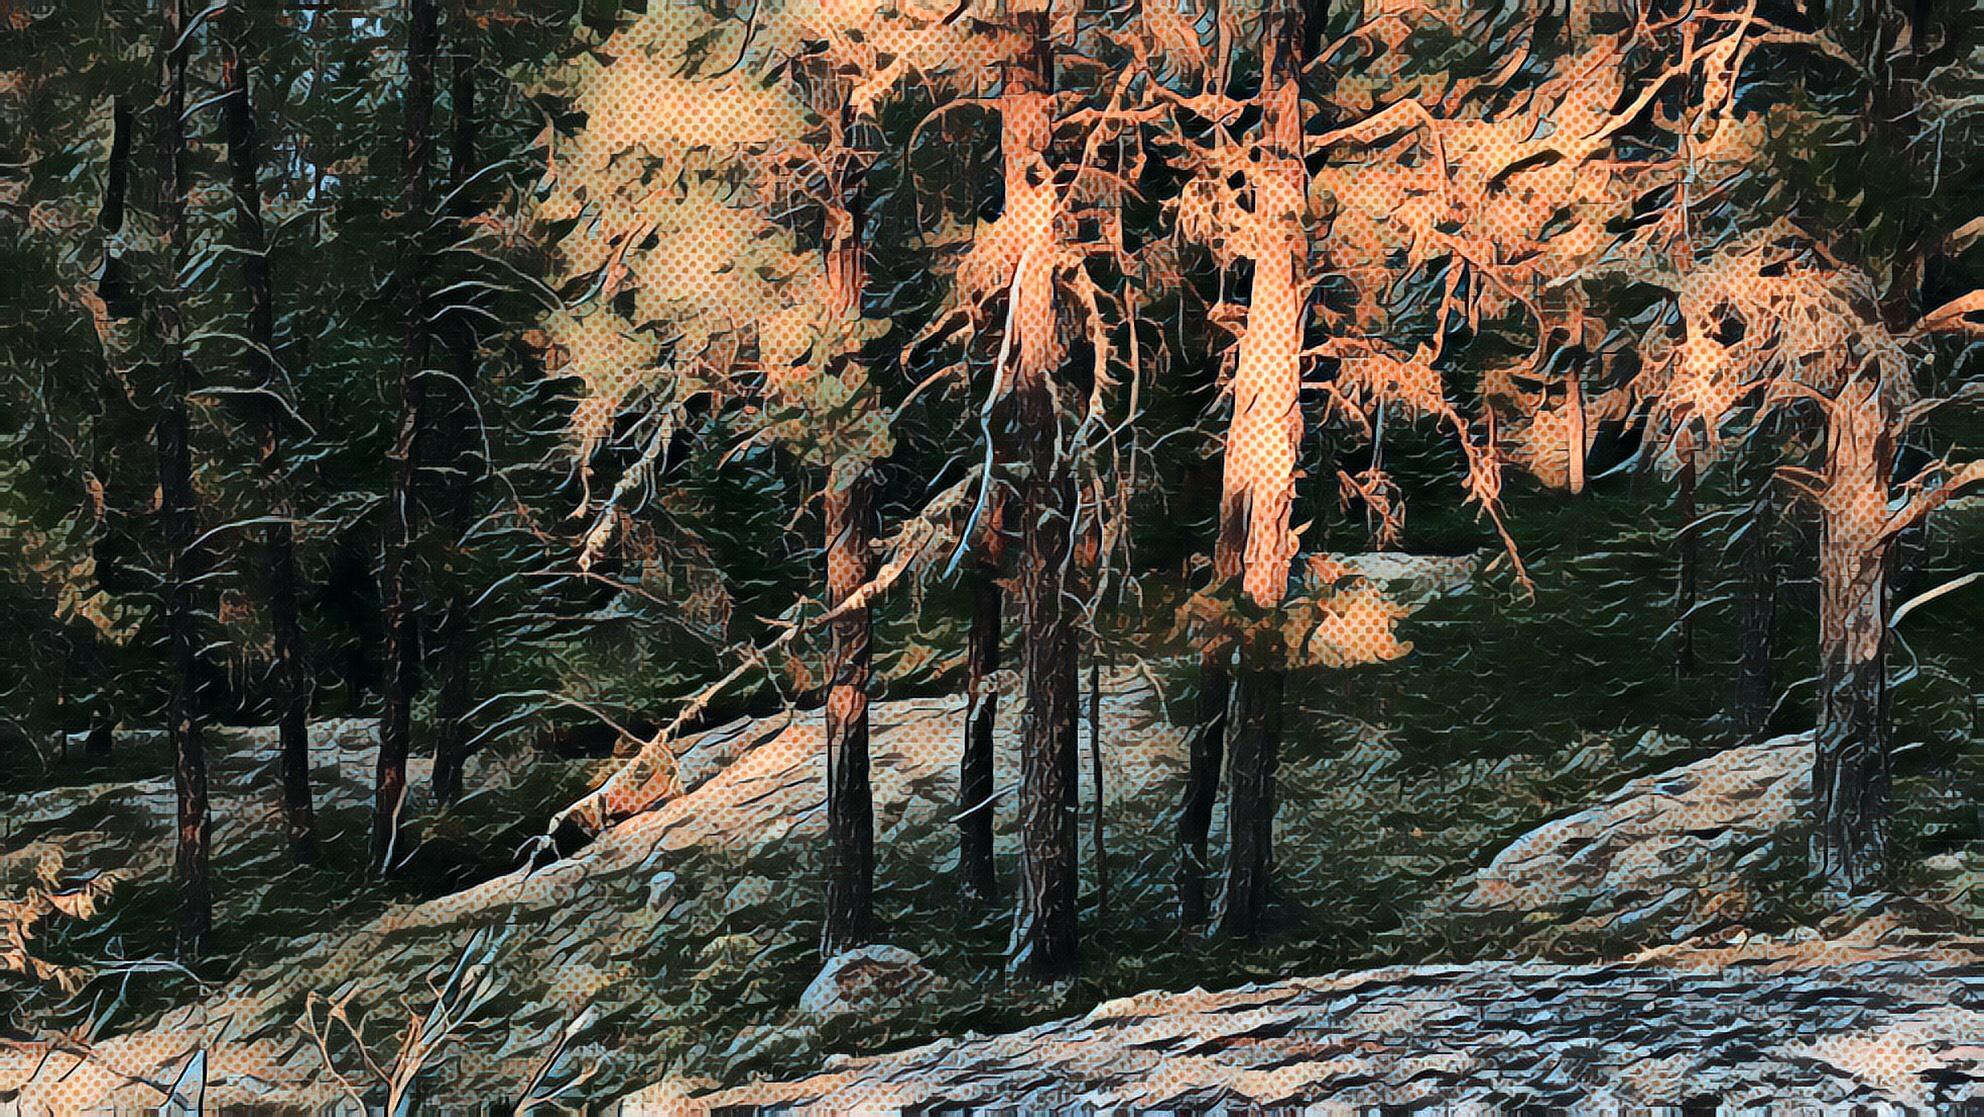 """Minaki Sunset"", Peter Graham, screenprint on paper, 18"" x 10"", edition of 10, 2018. $350"